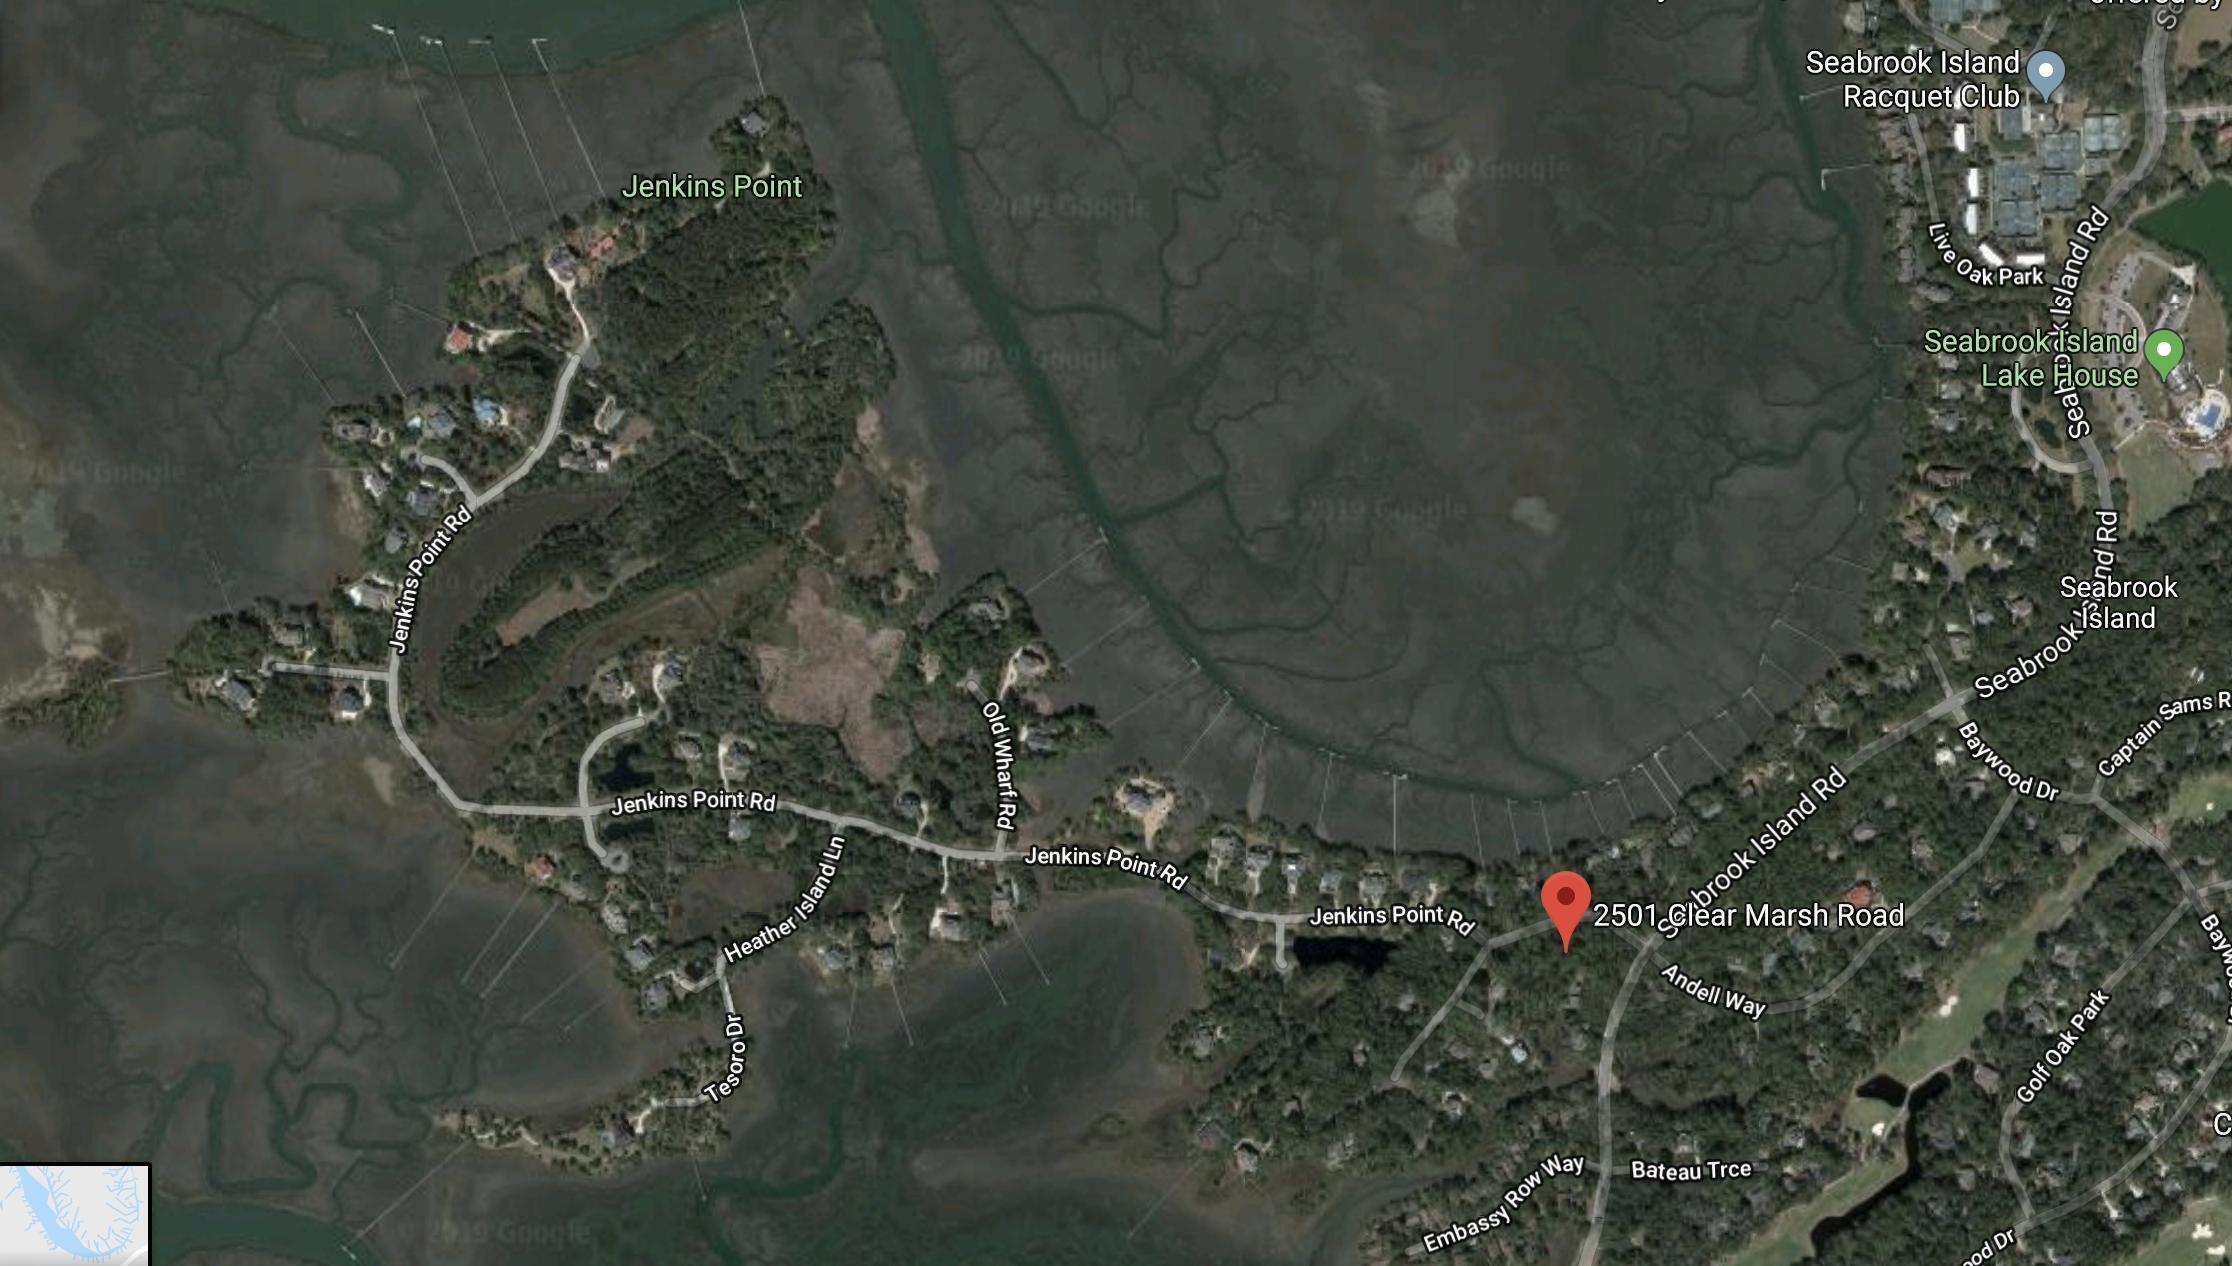 2501 Clear Marsh Road Seabrook Island, SC 29455